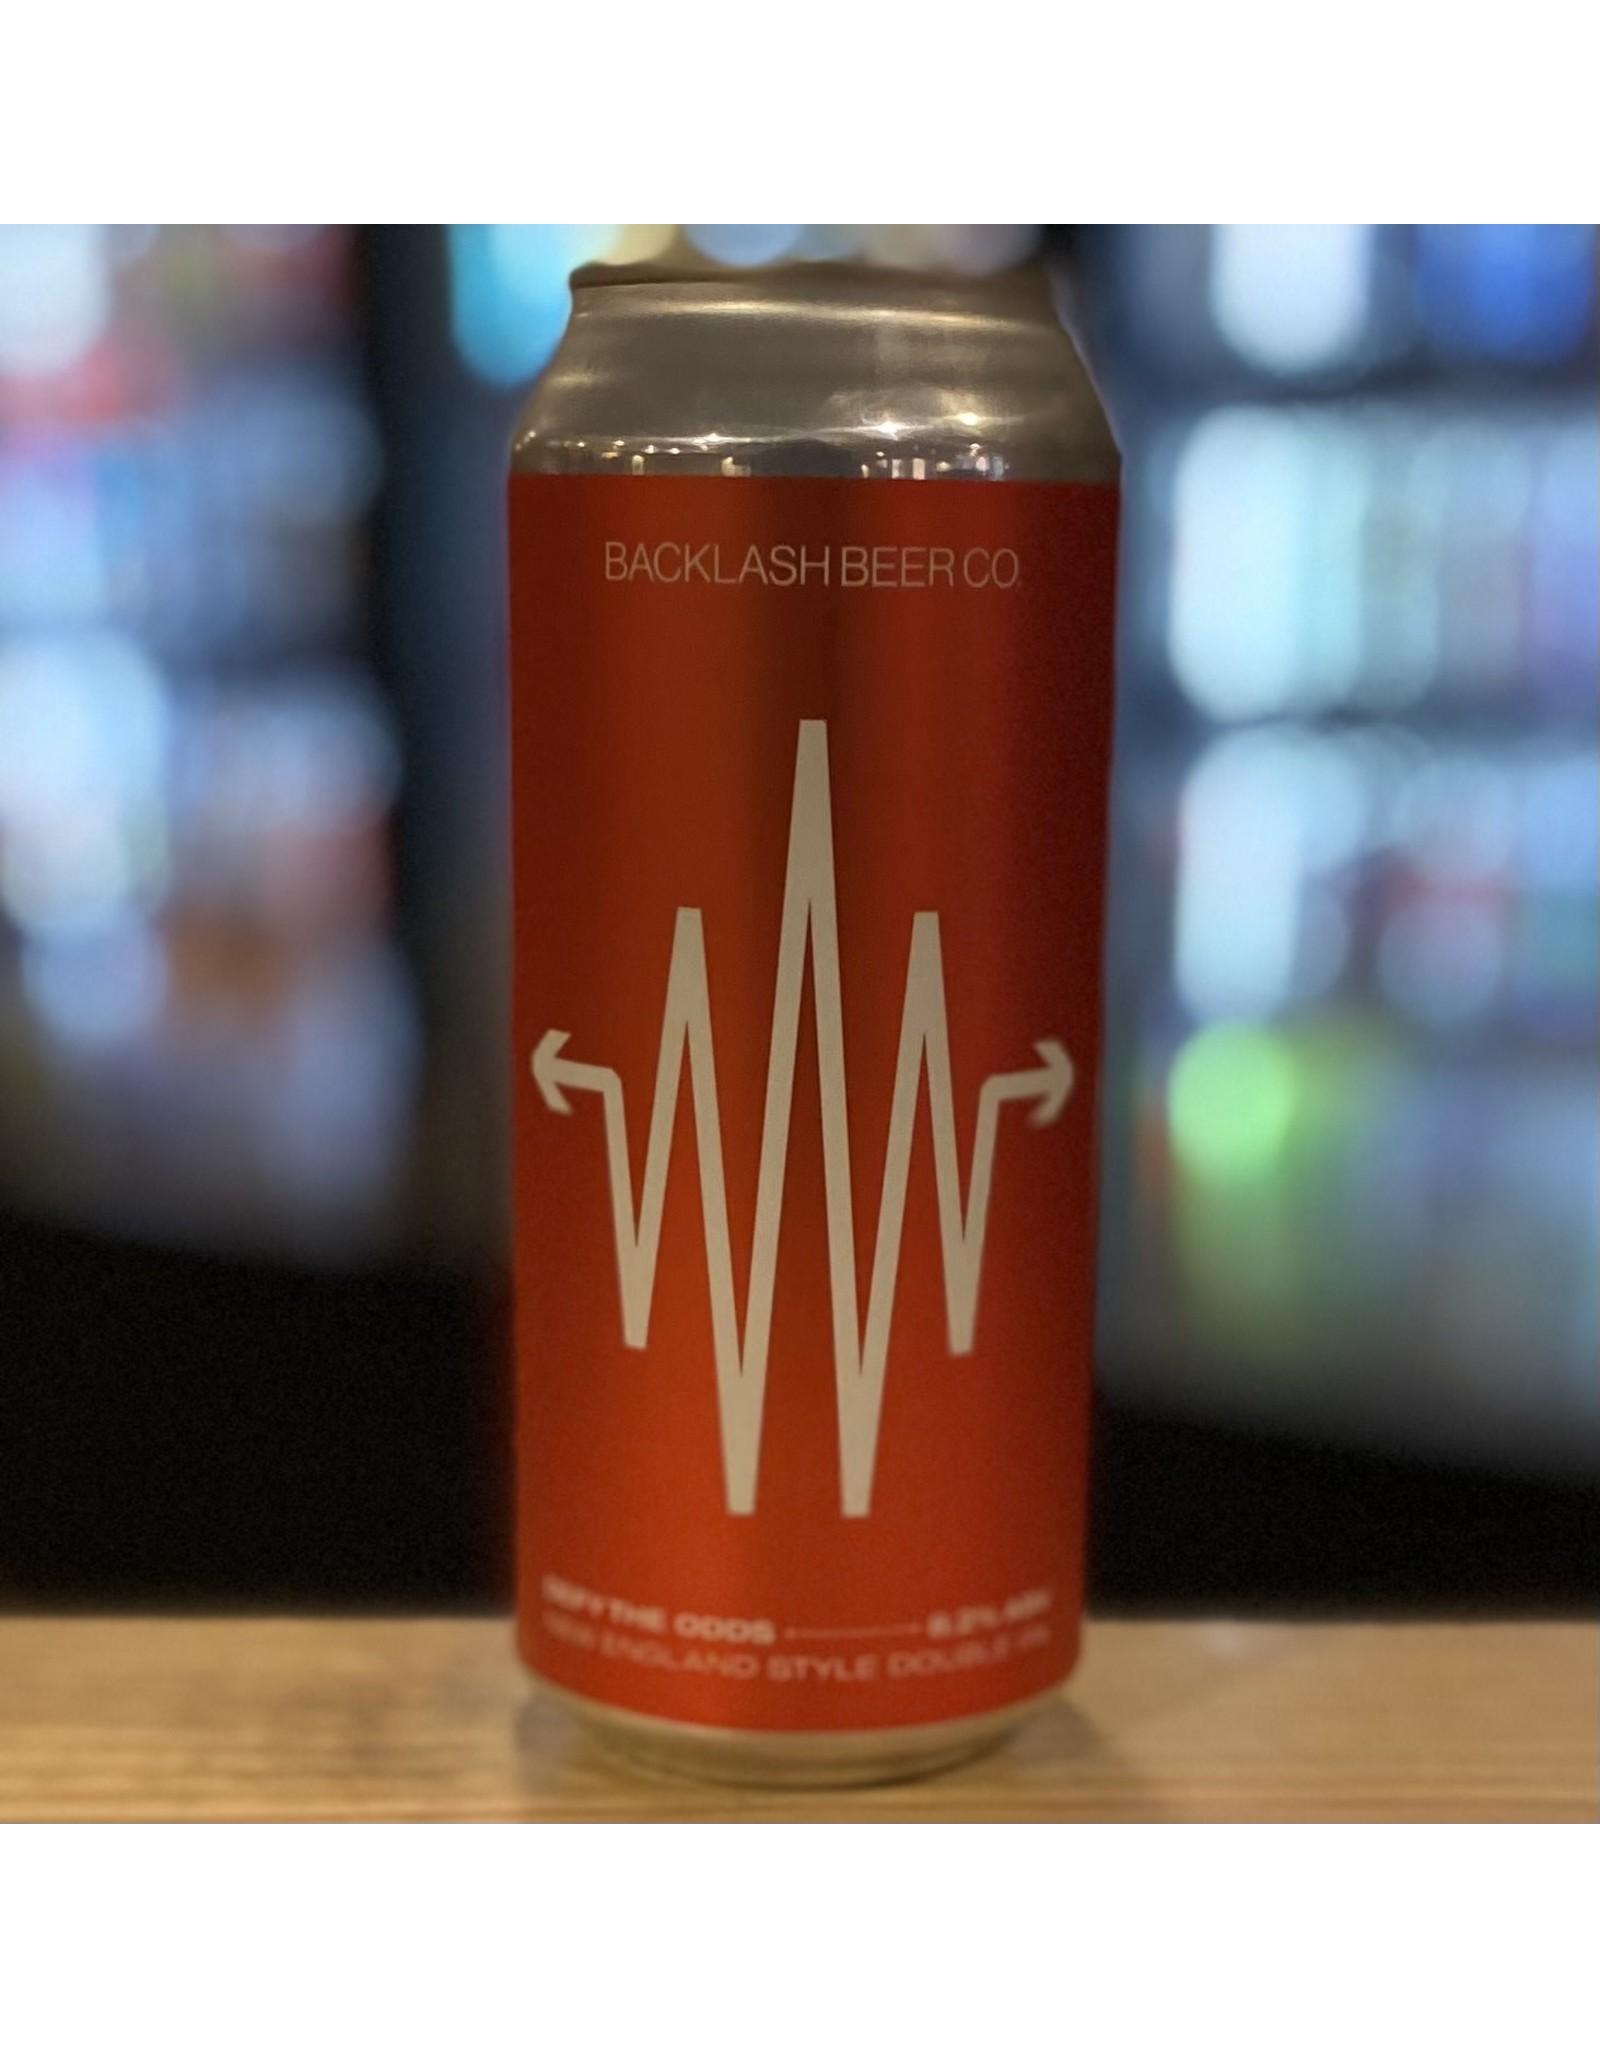 "DIPA Backlash Beer Co ""Defy The Odds"" NEDIPA - Boston, MA"